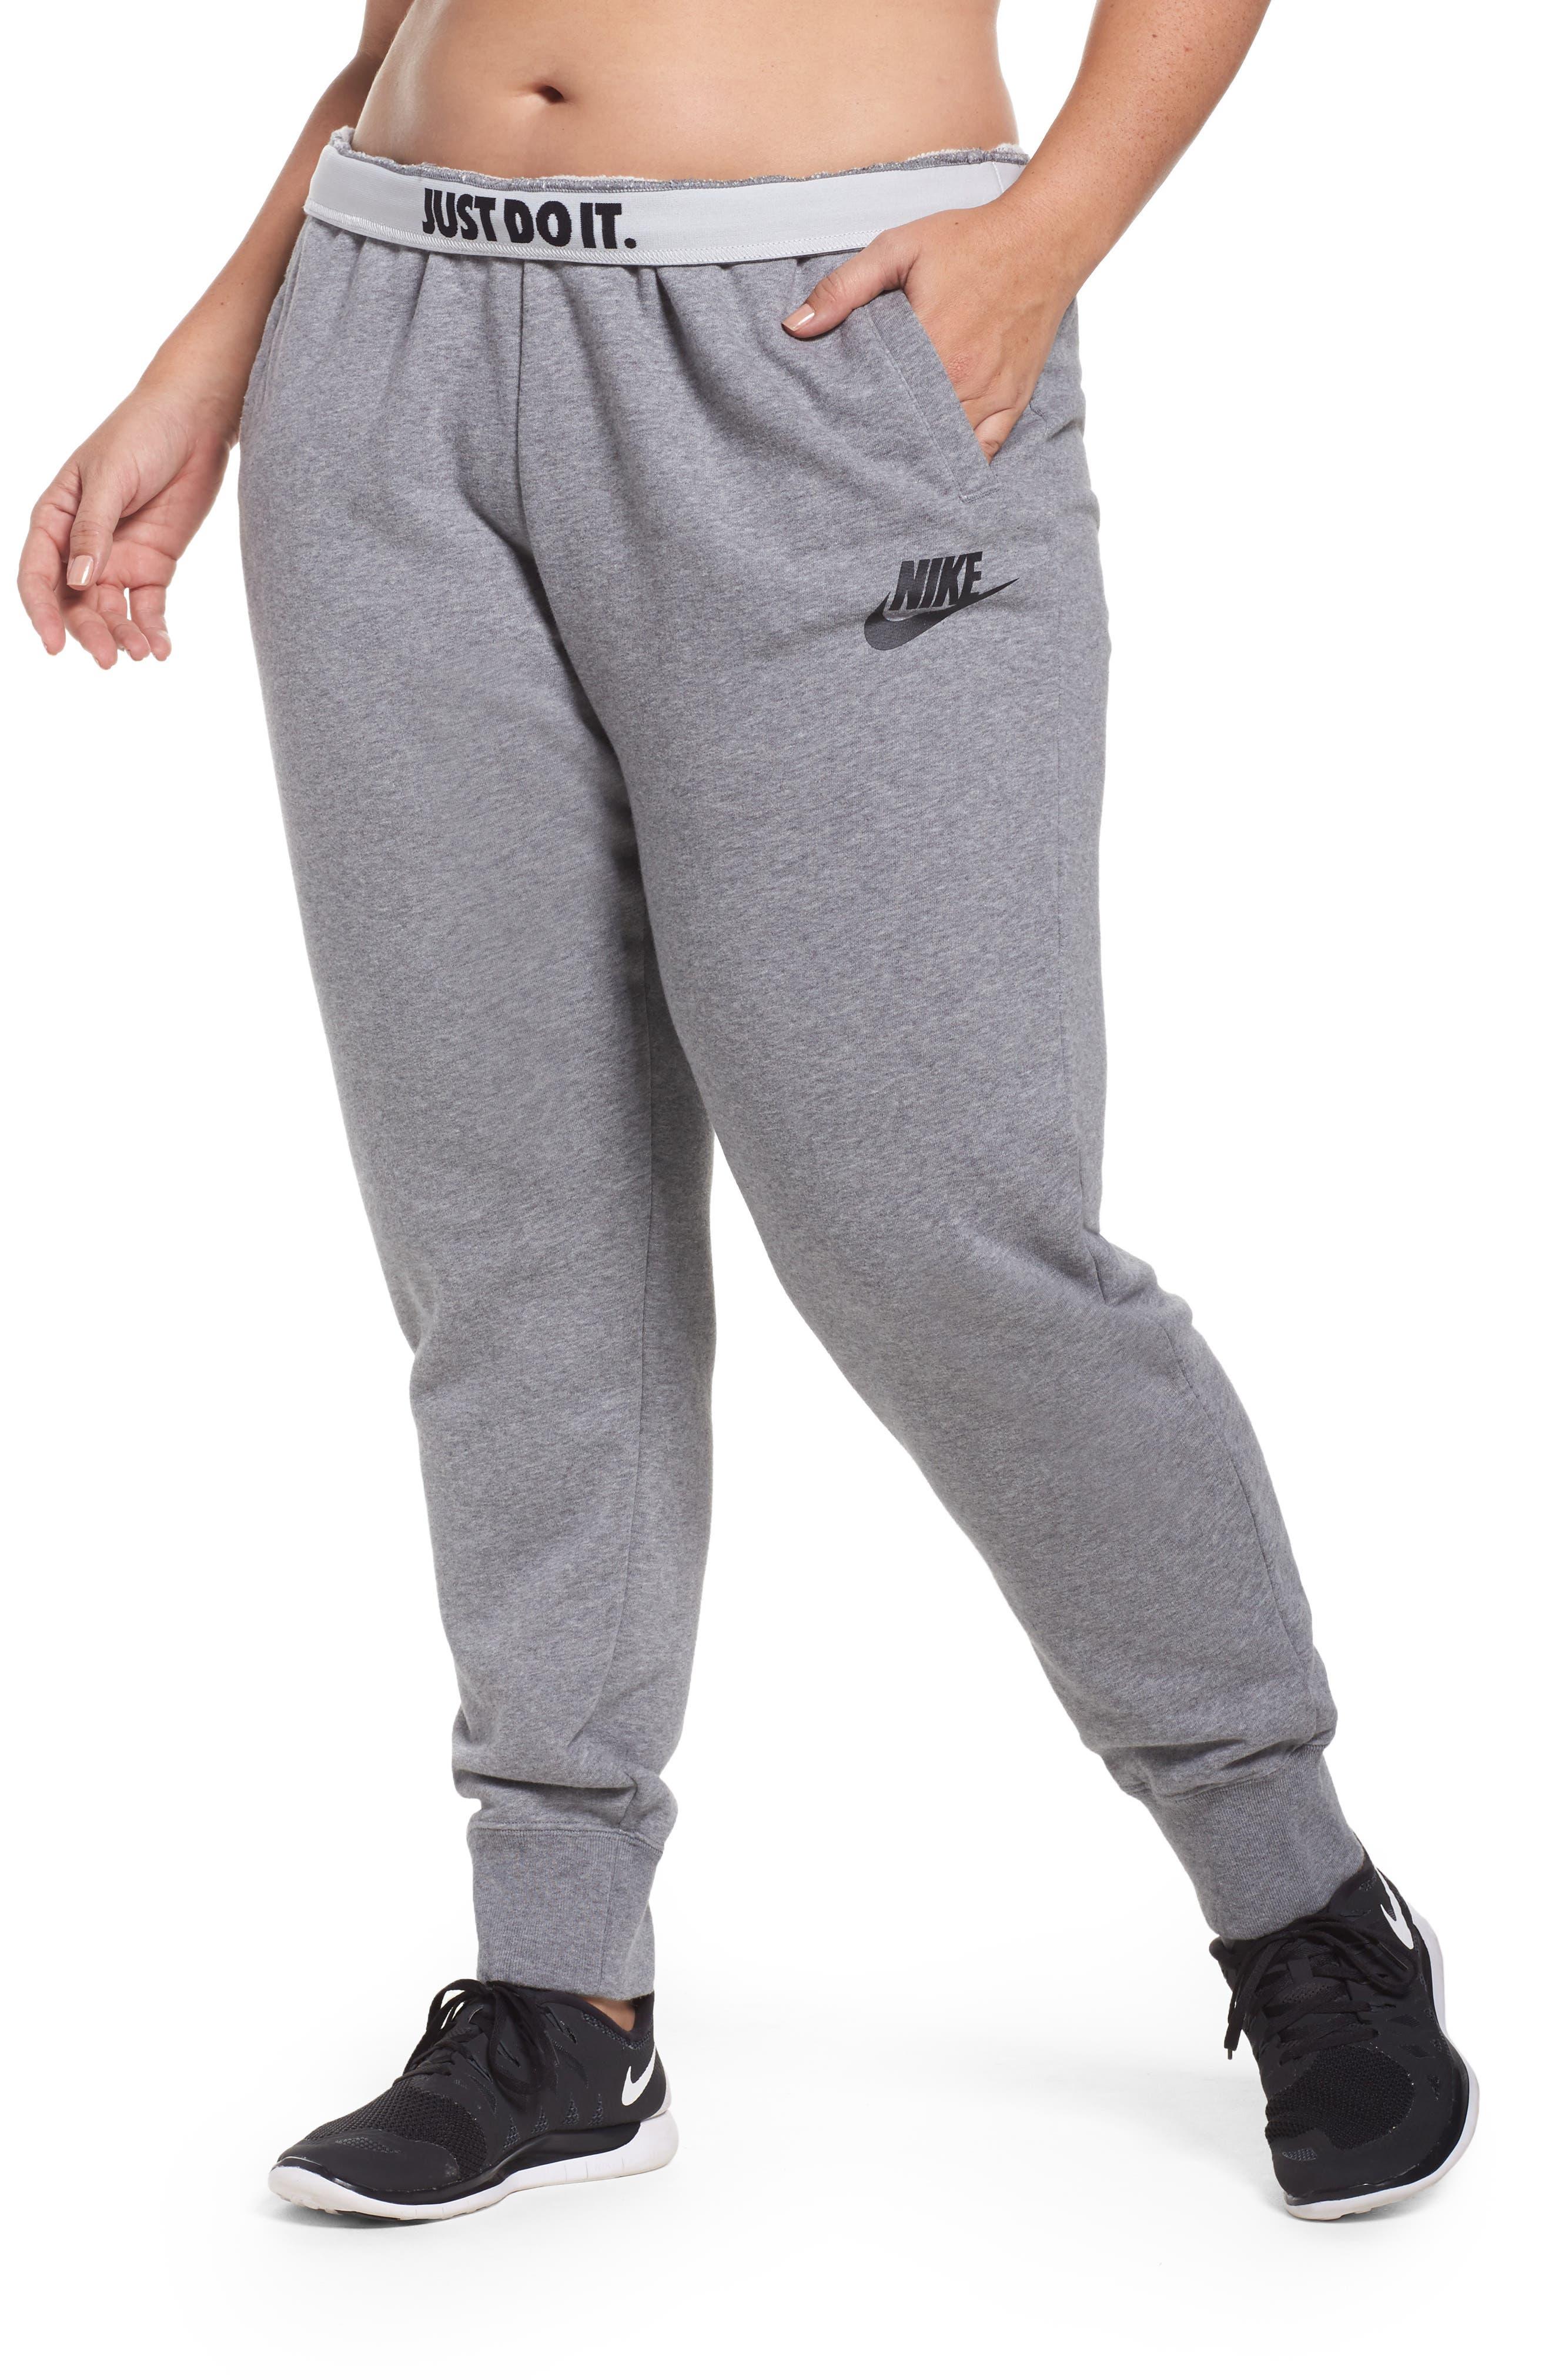 Drawstring Fleece Pants,                         Main,                         color, Carbon Heather/Cool Grey/Black